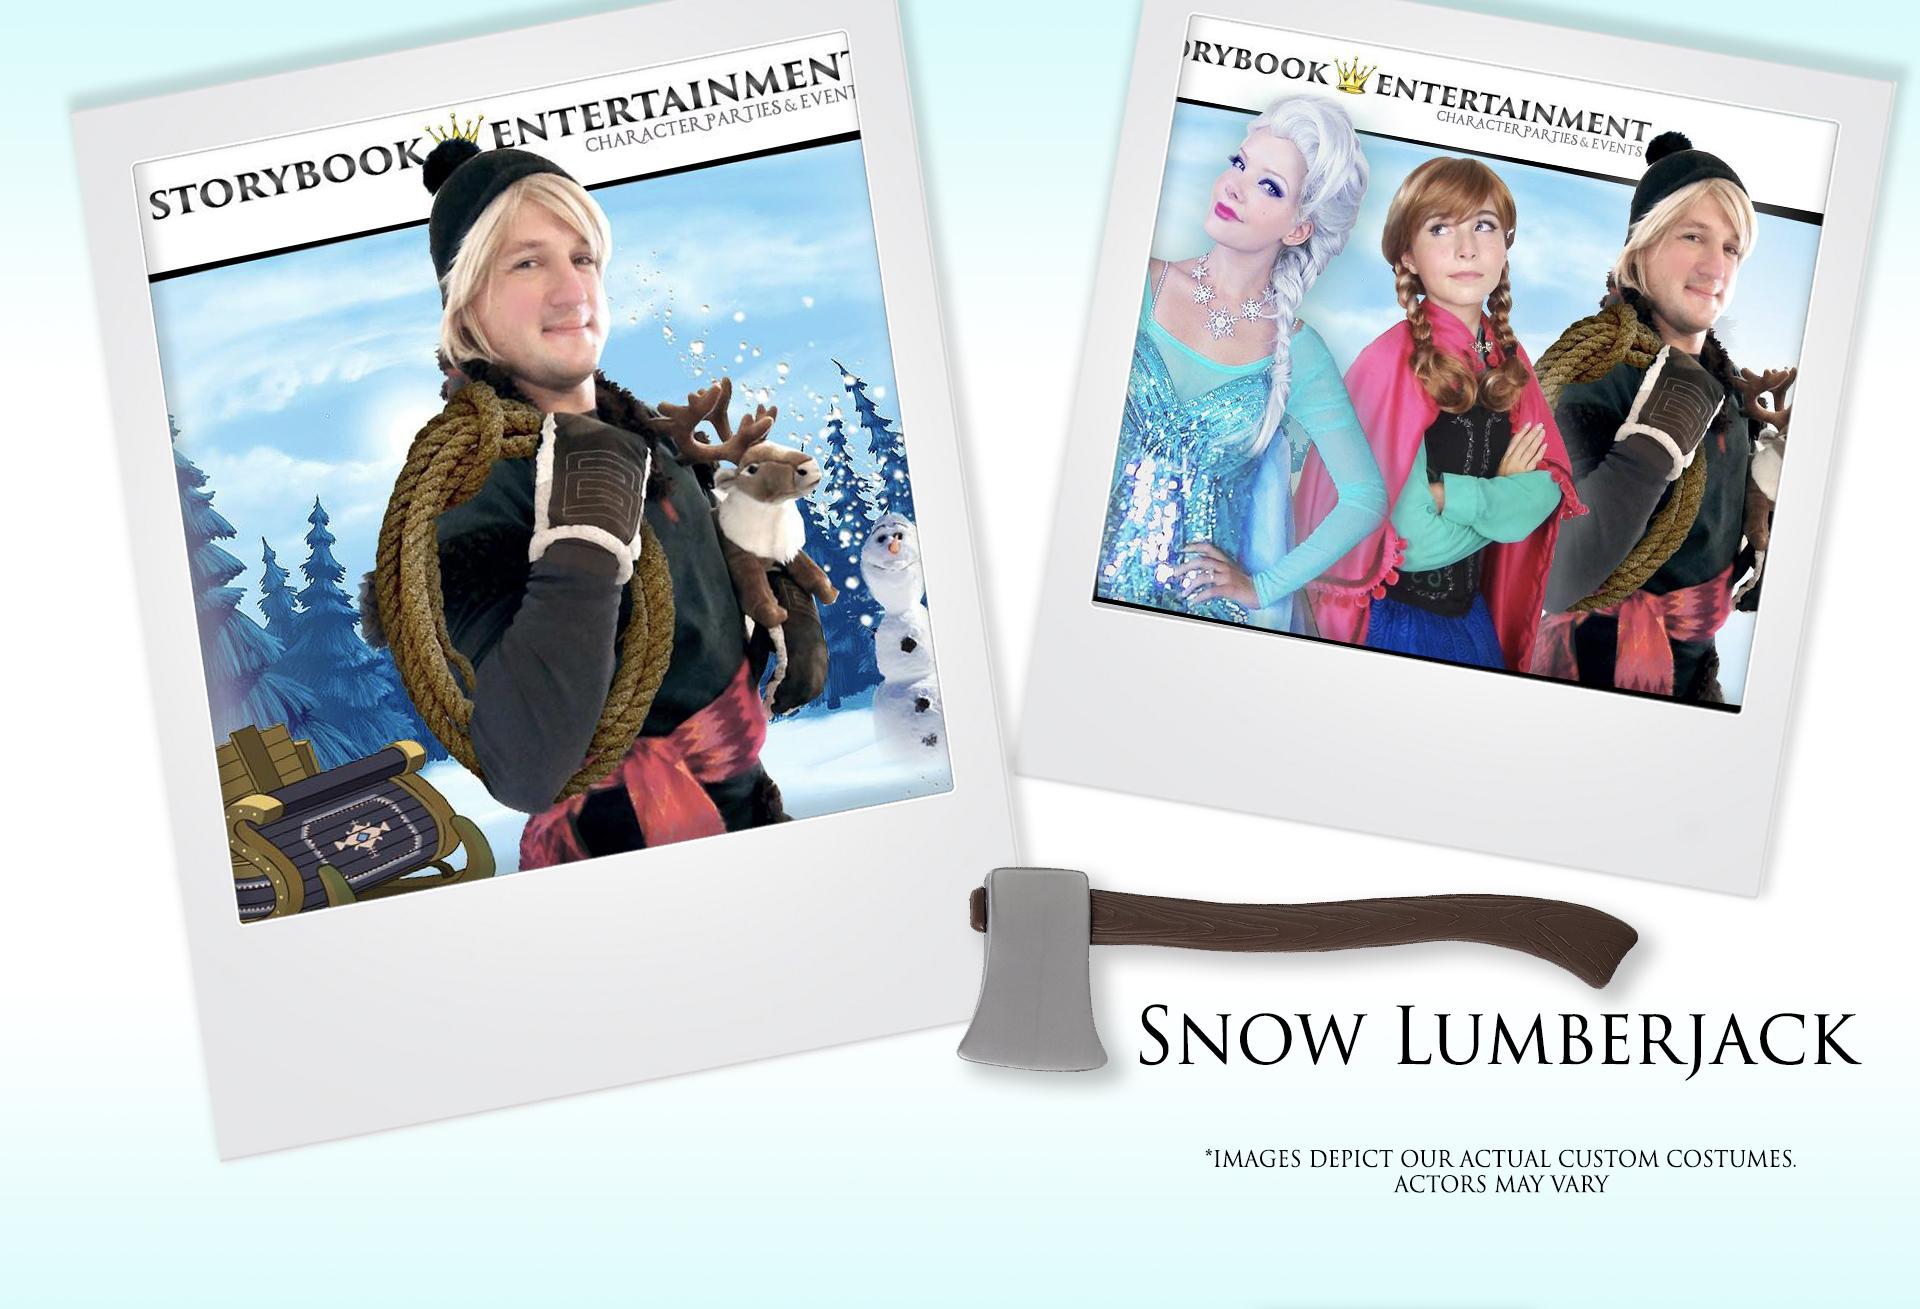 Snow Lumberjack